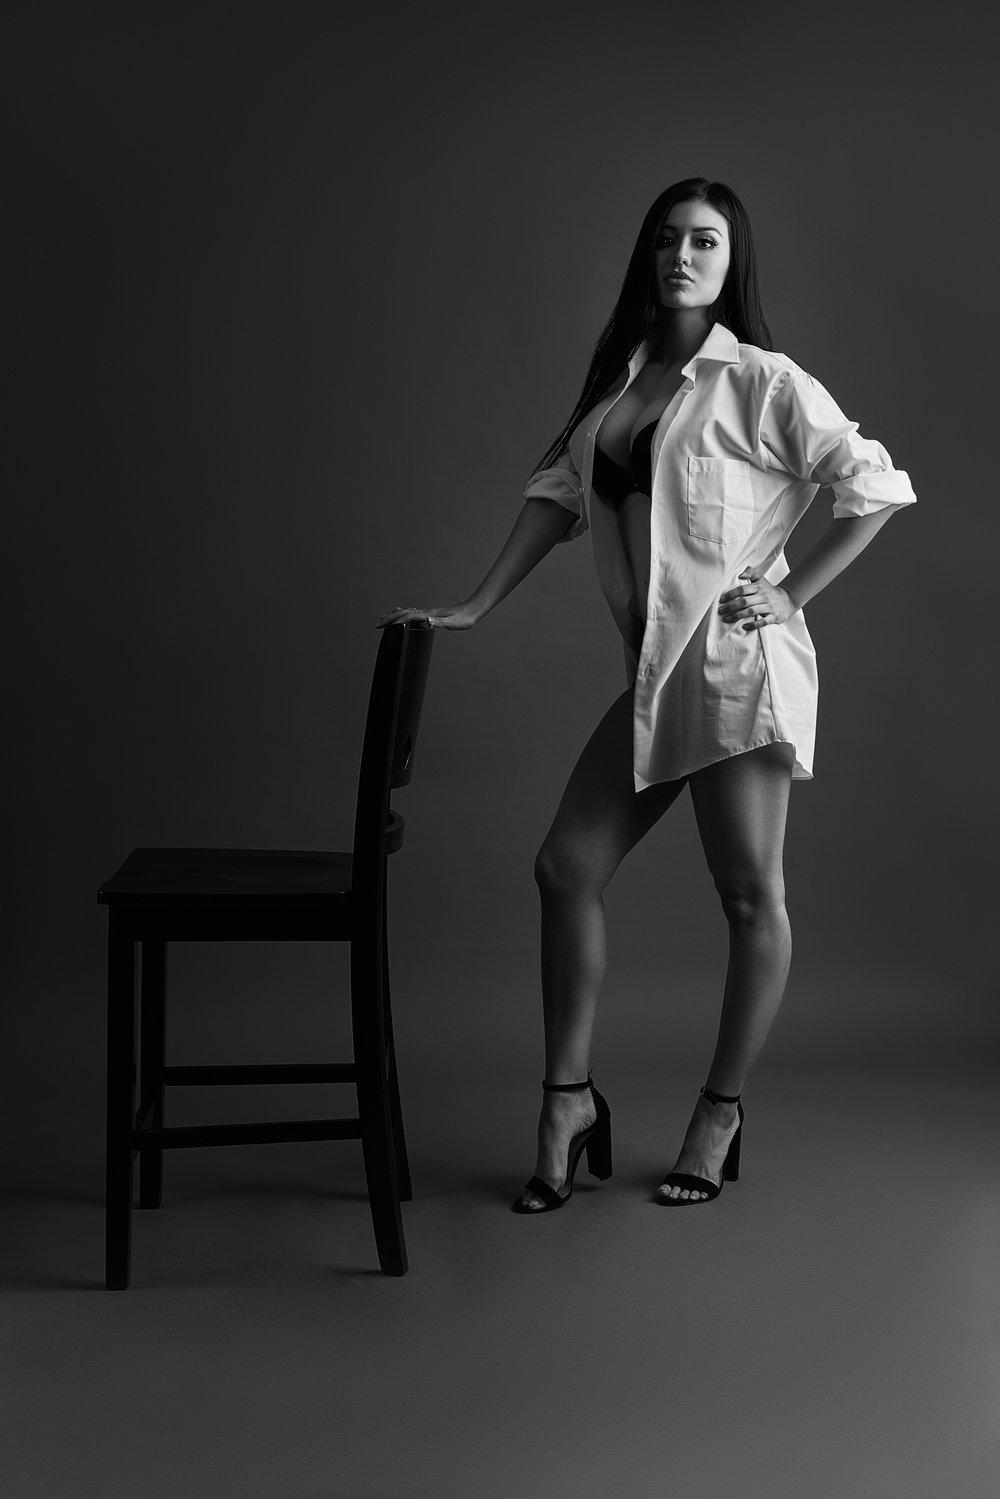 Veronica Fashion Model by Arizona Fashion Portrait Photographer Chad Weed